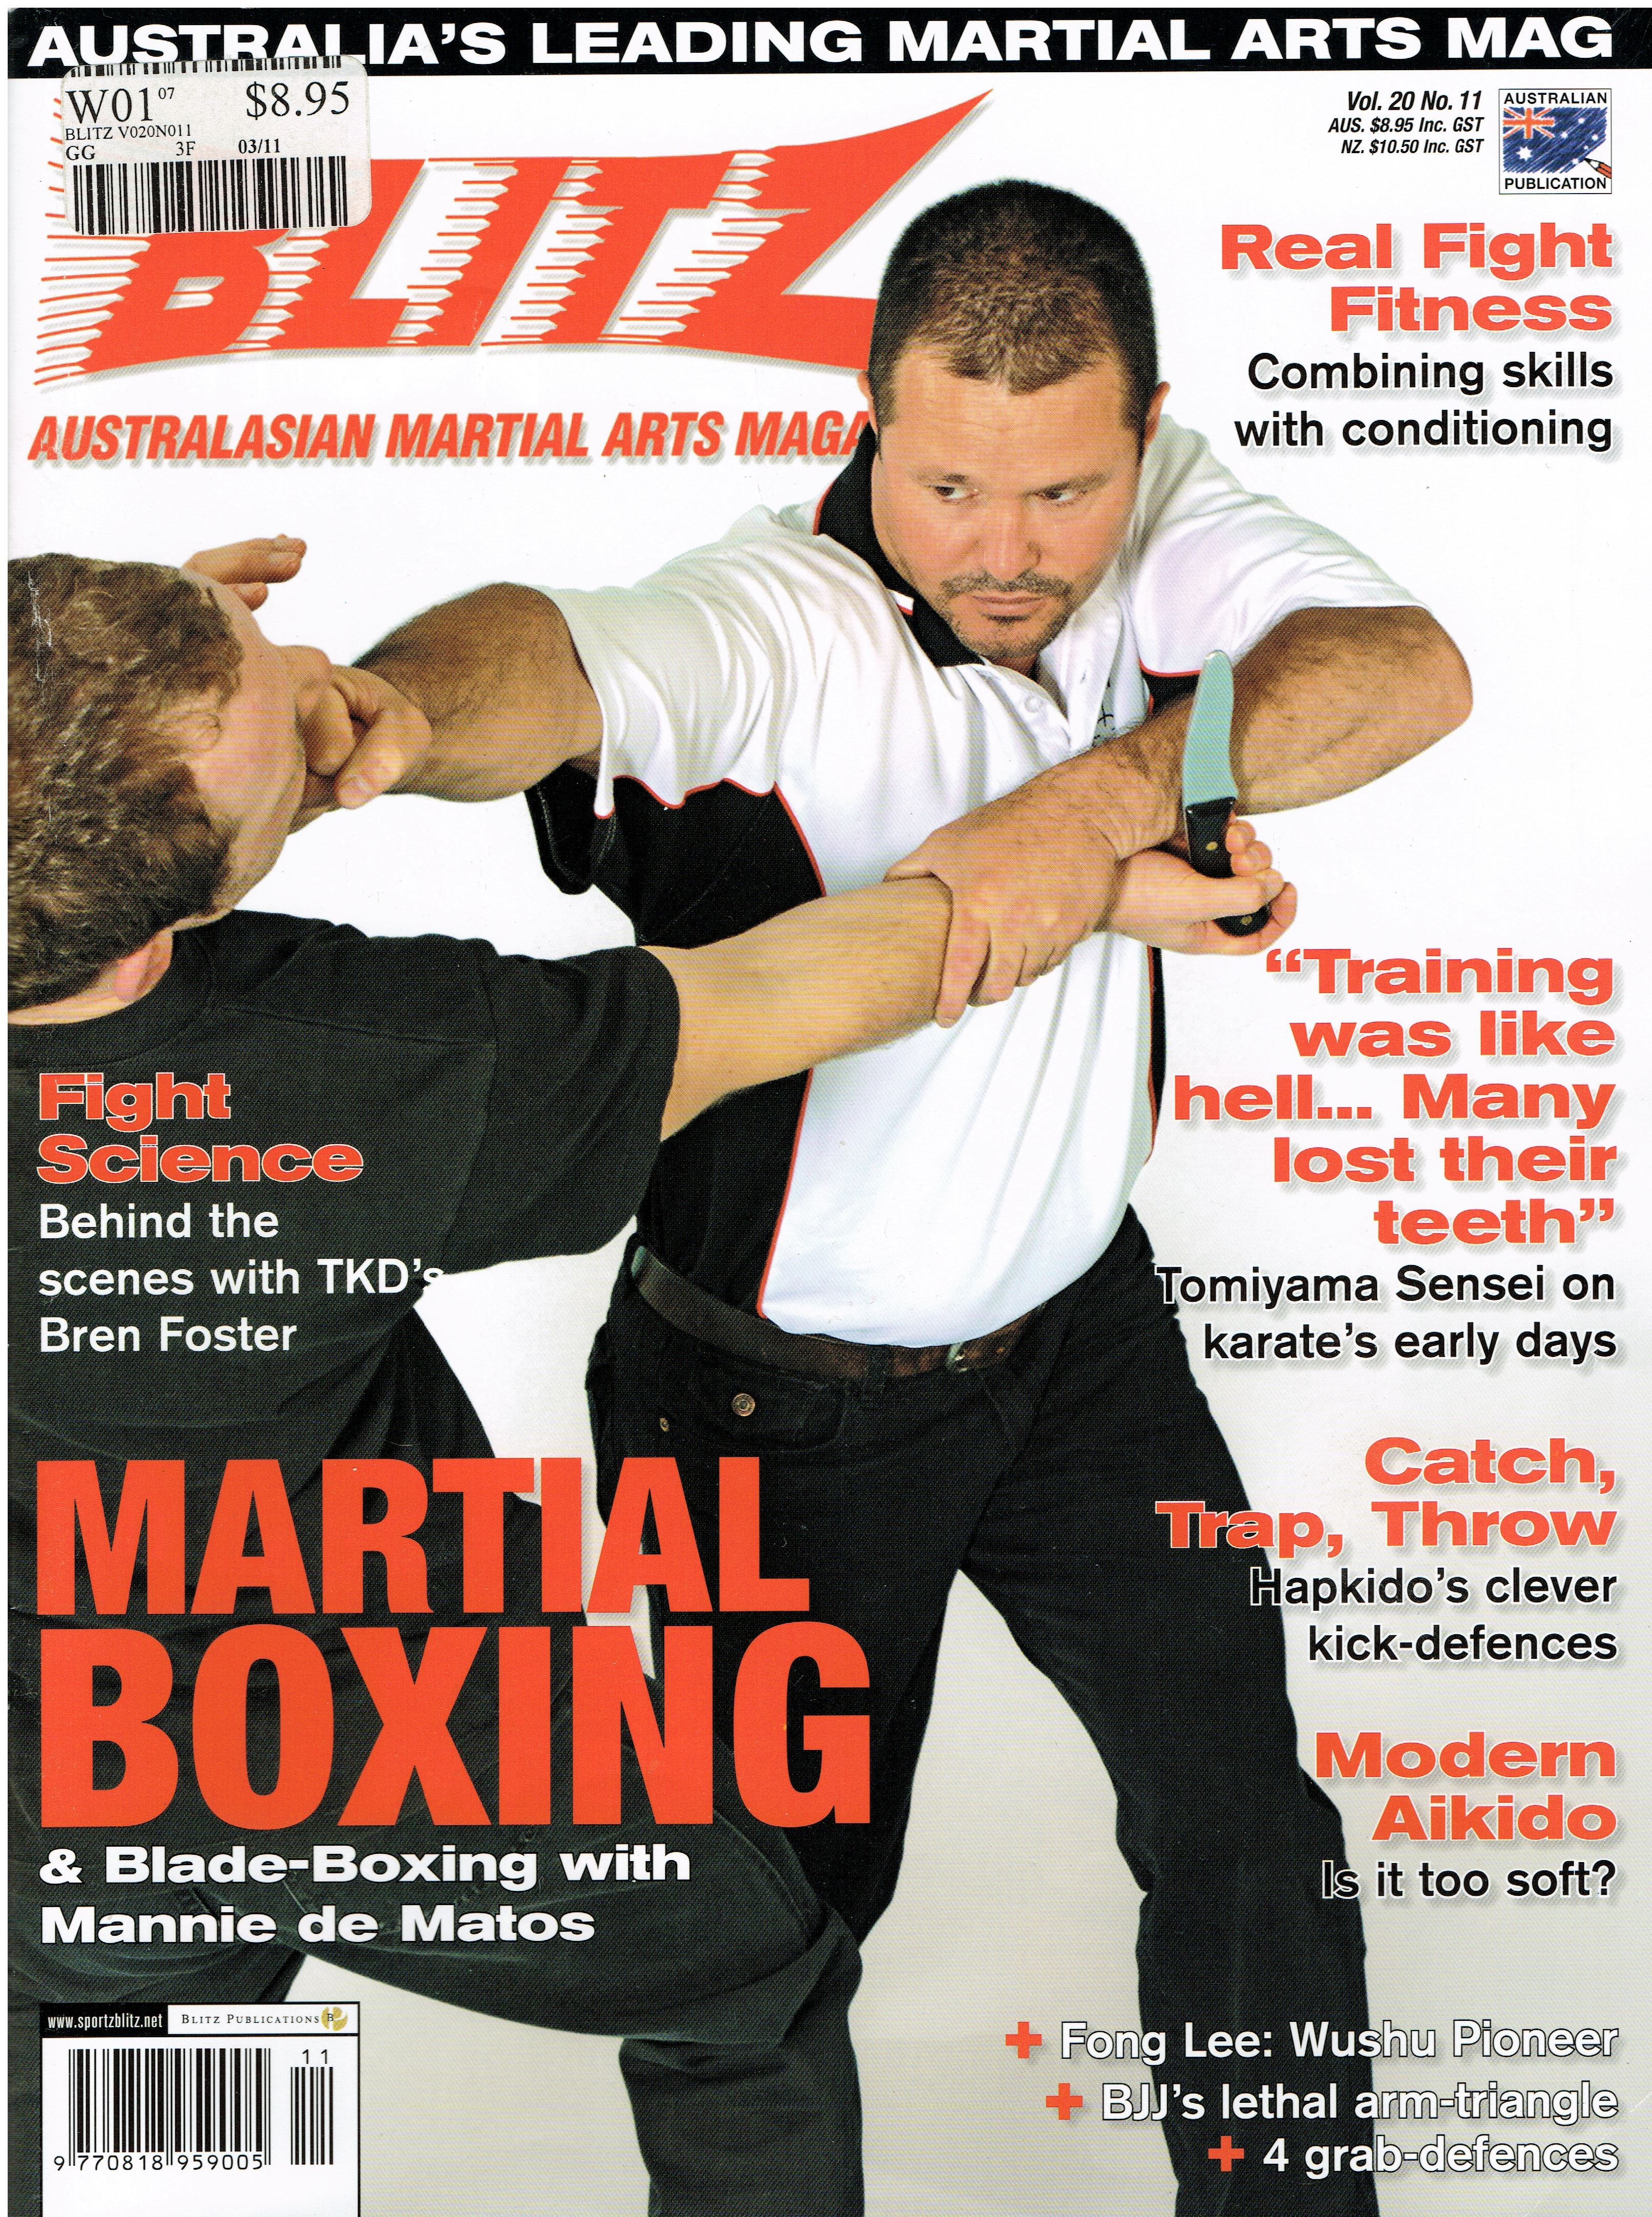 Aikido and Bob Jones join ki forces